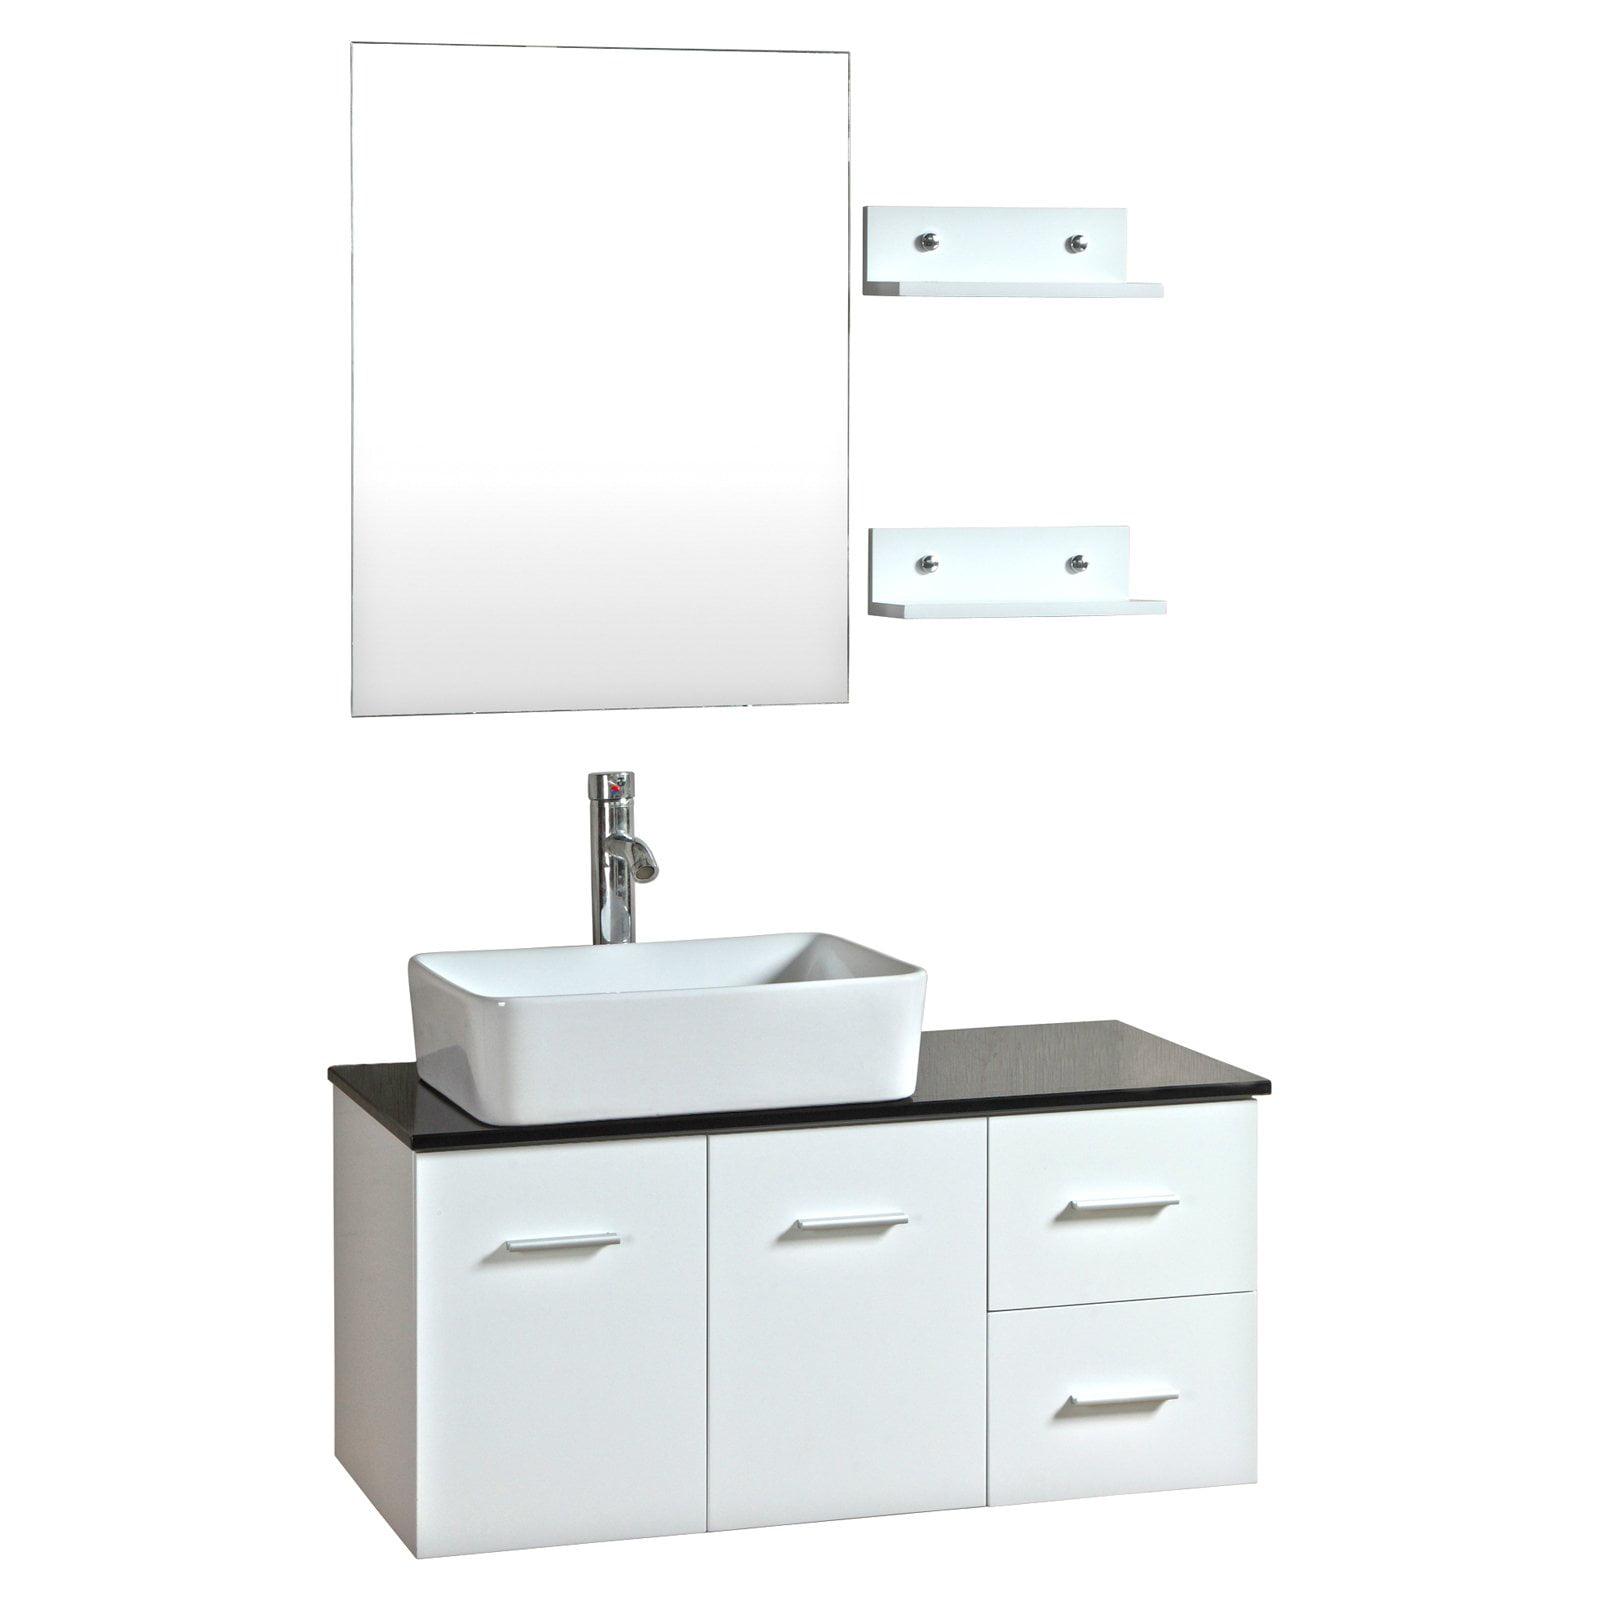 Kokols 9093 36 In Single Sink Bathroom Vanity Walmart Com